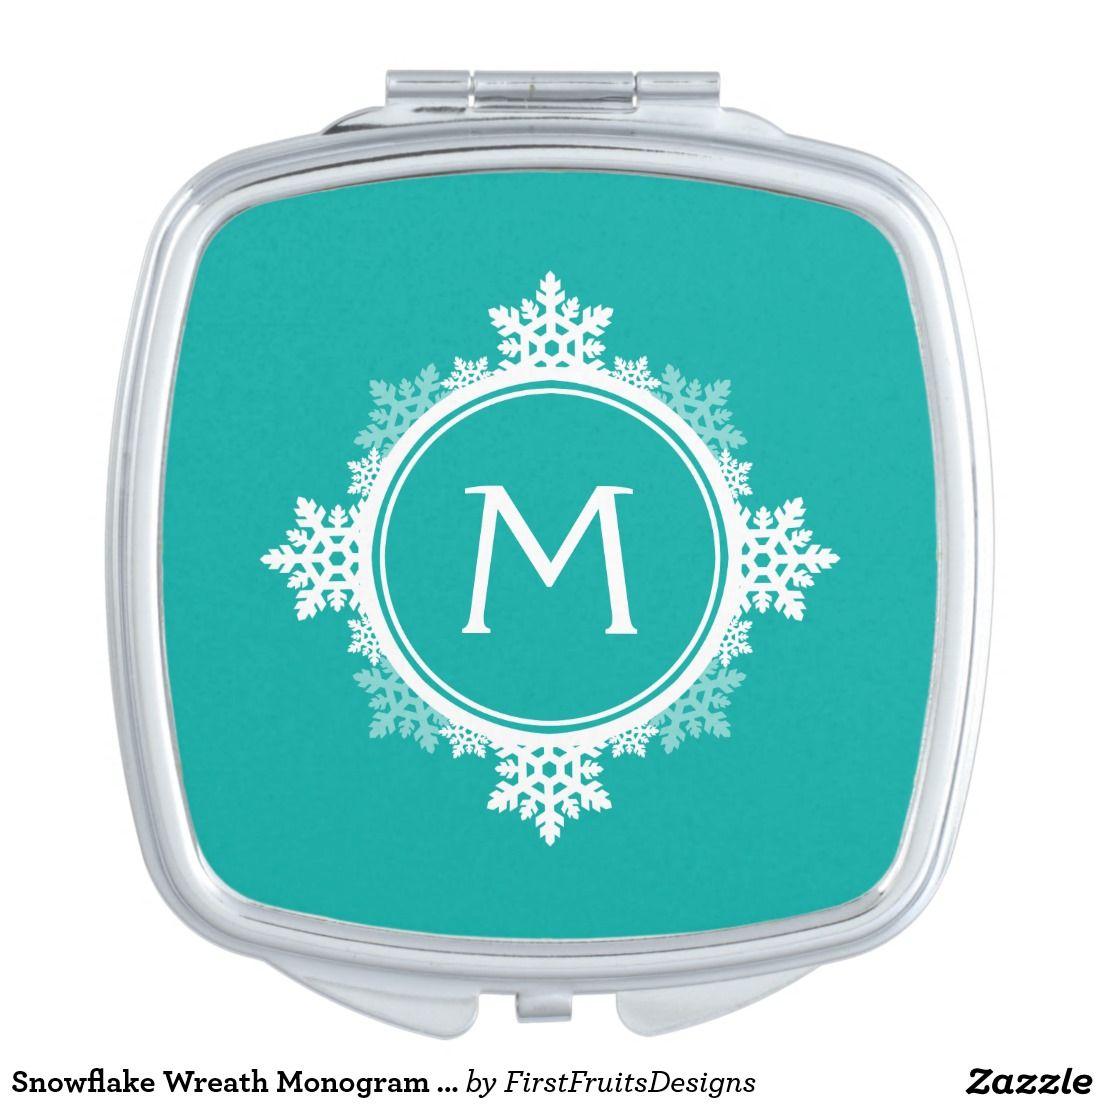 Snowflake Wreath Monogram in Teal Blue & White Mirror For Makeup